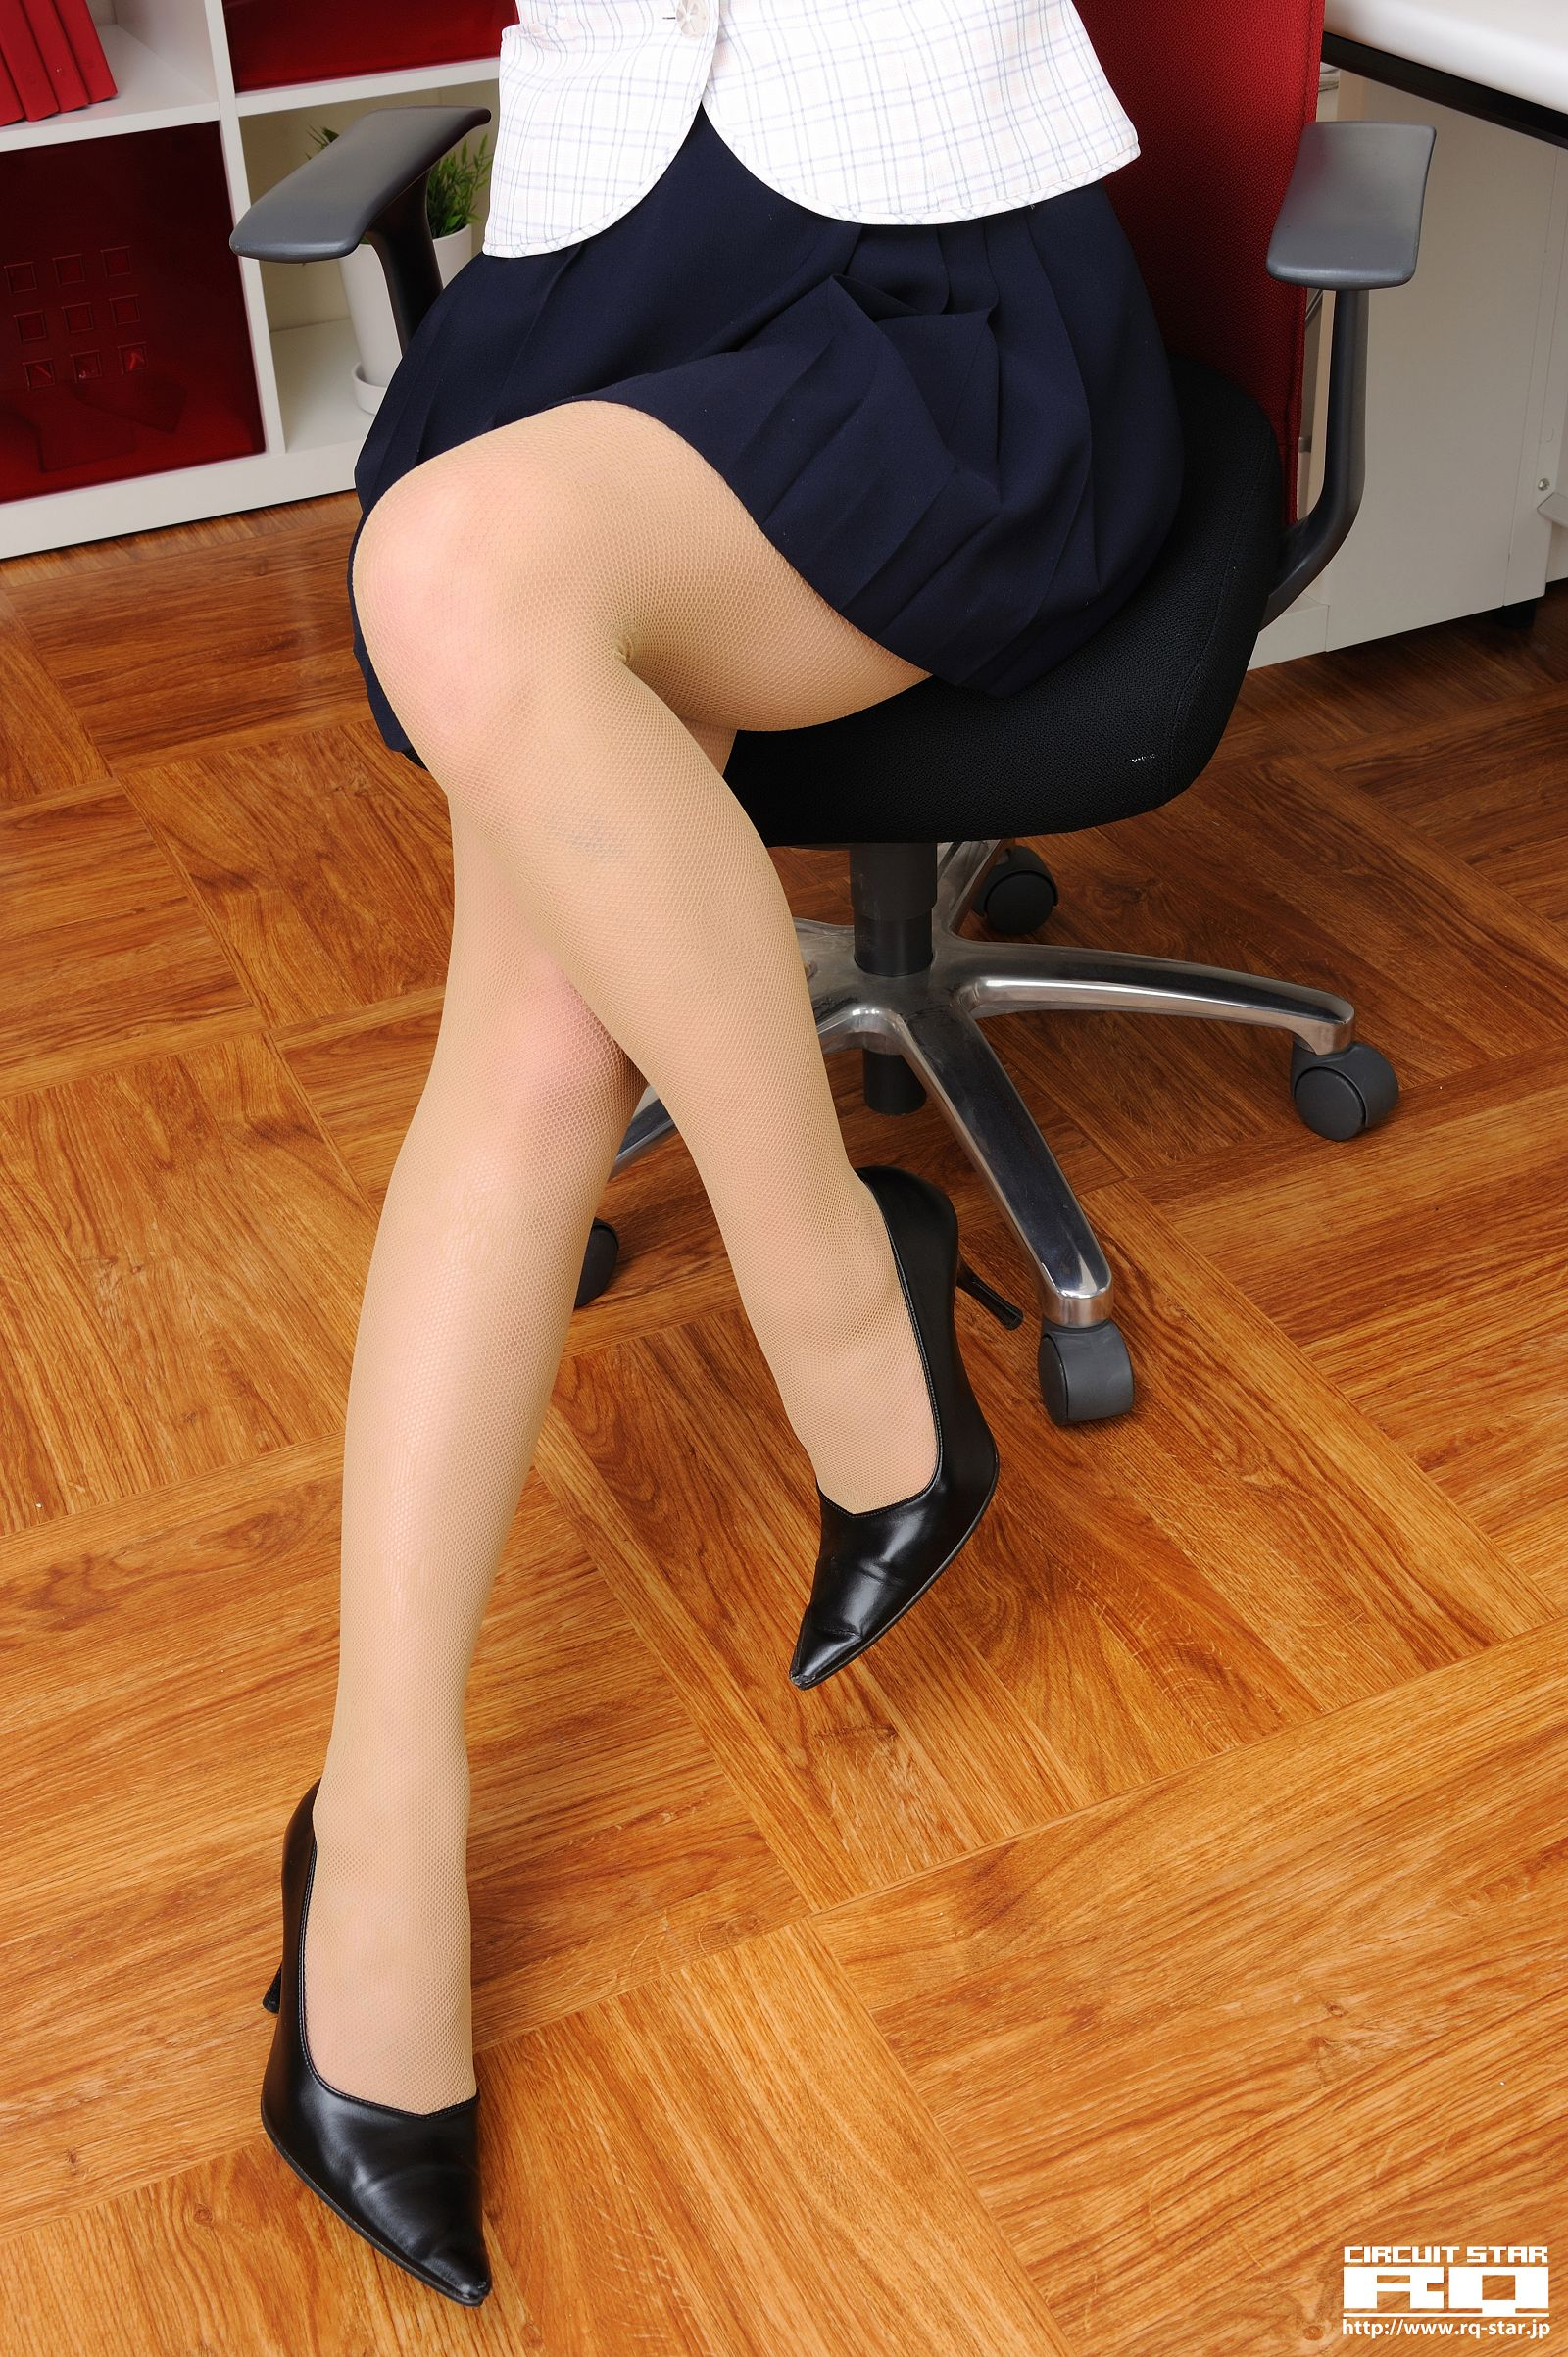 [RQ STAR美女] NO.00469 Megumi Haruna 春菜めぐみ Office Lady[96P] RQ STAR 第4张